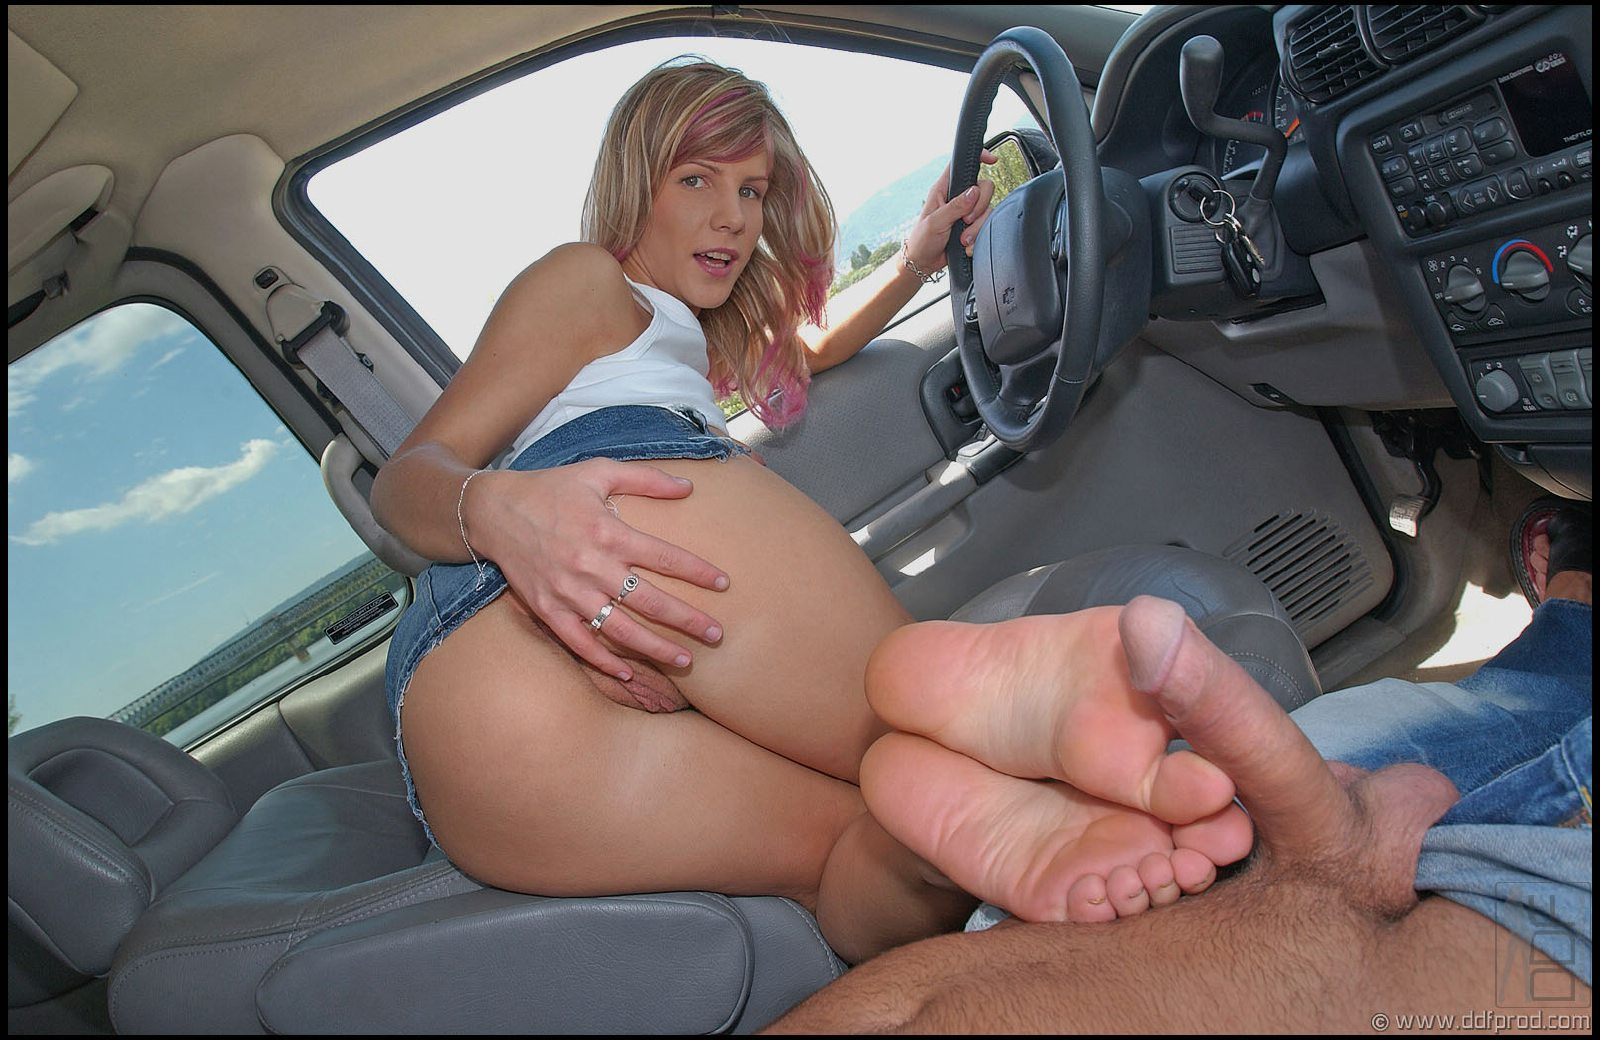 Footjob in a car